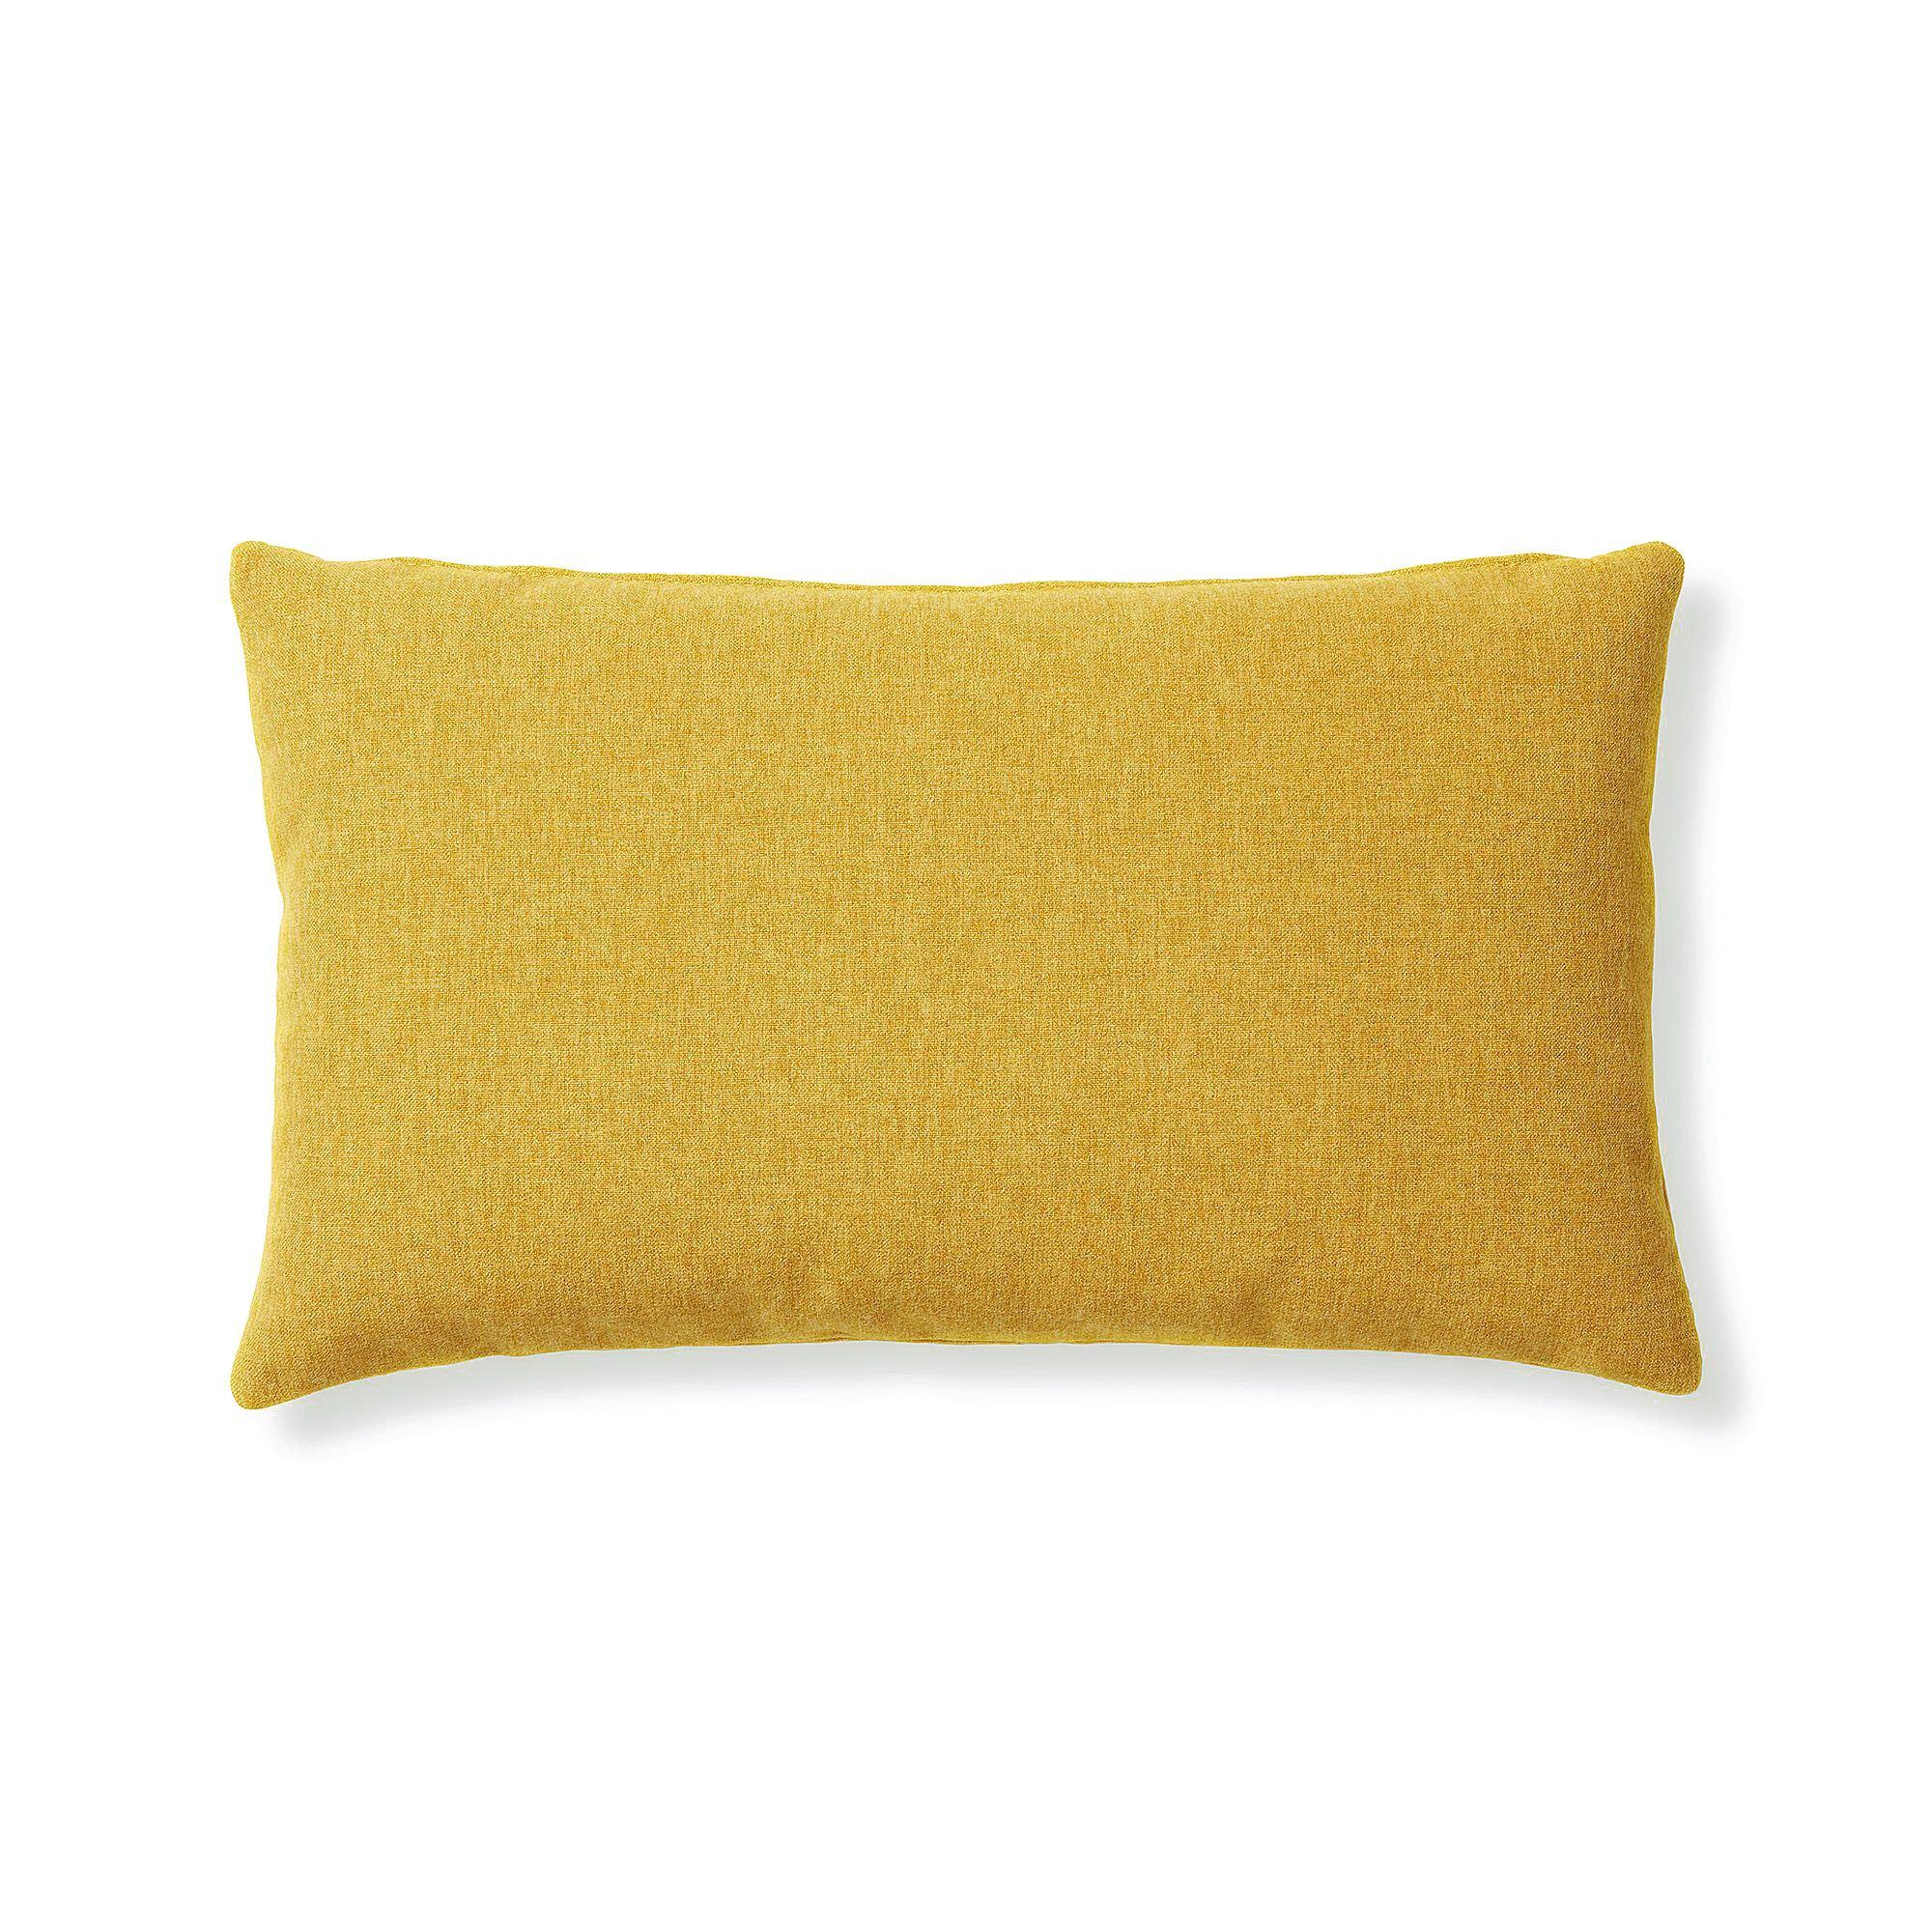 Franco Fabric Lumbar Cushion, Mustard